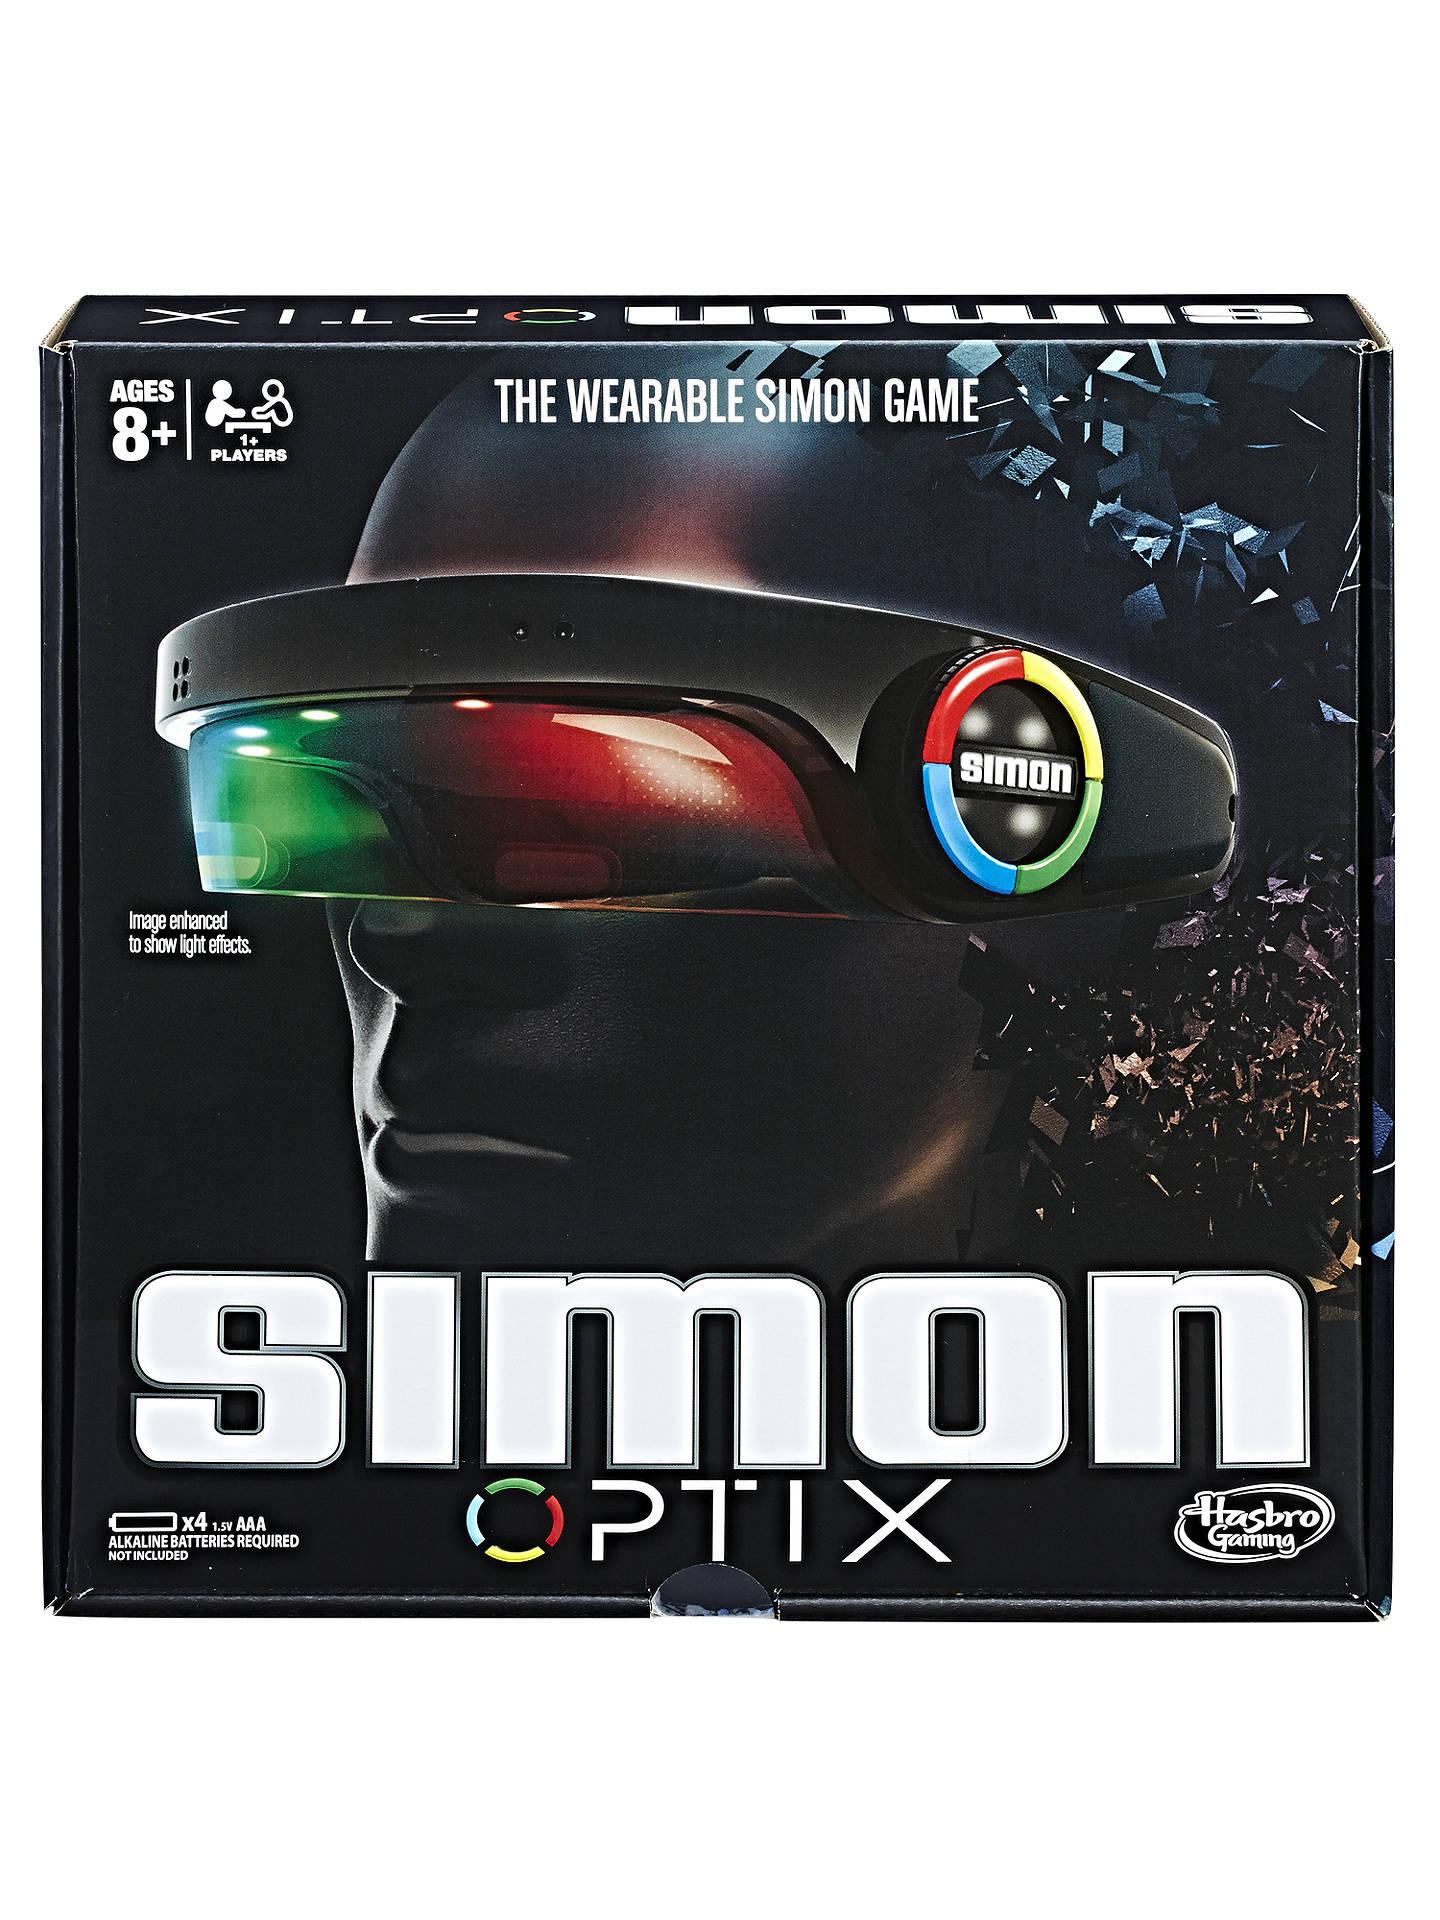 Hasbro Simon Optix Game 2 Pack